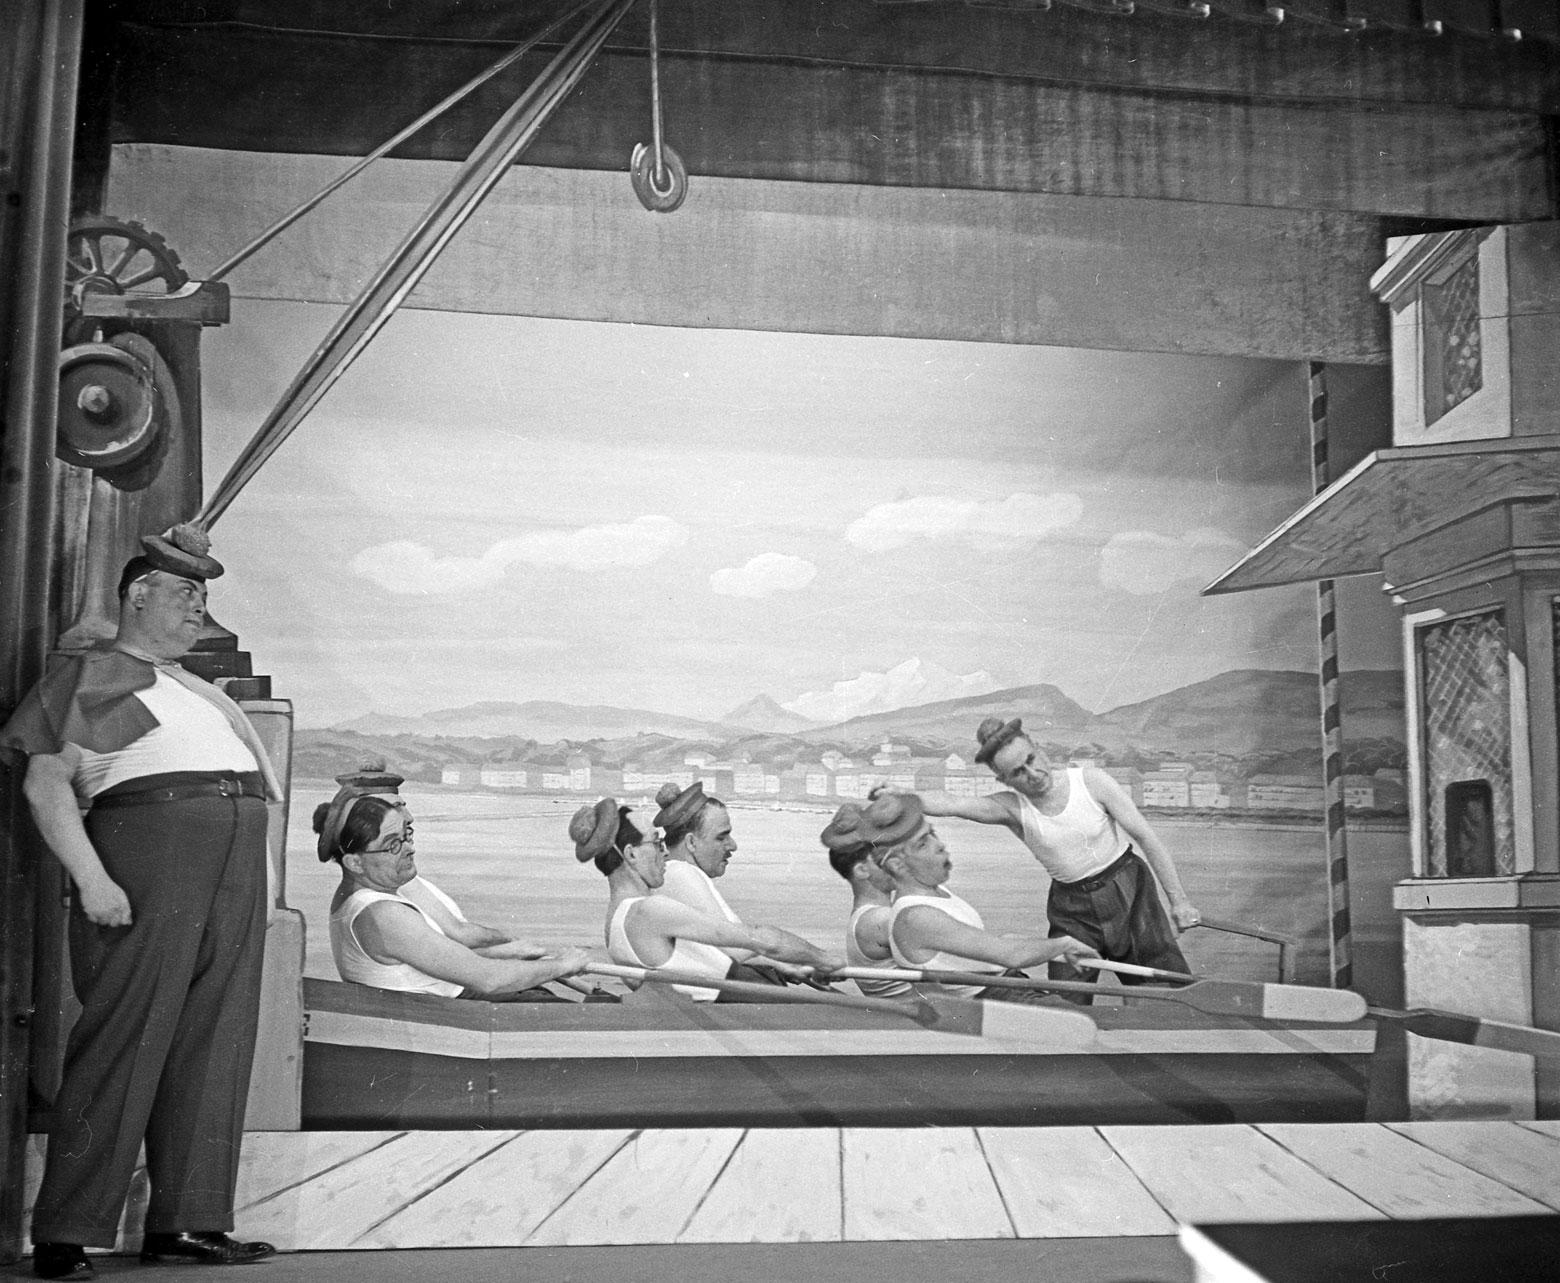 Revue 1941 ©Centre d'iconographie genevoise